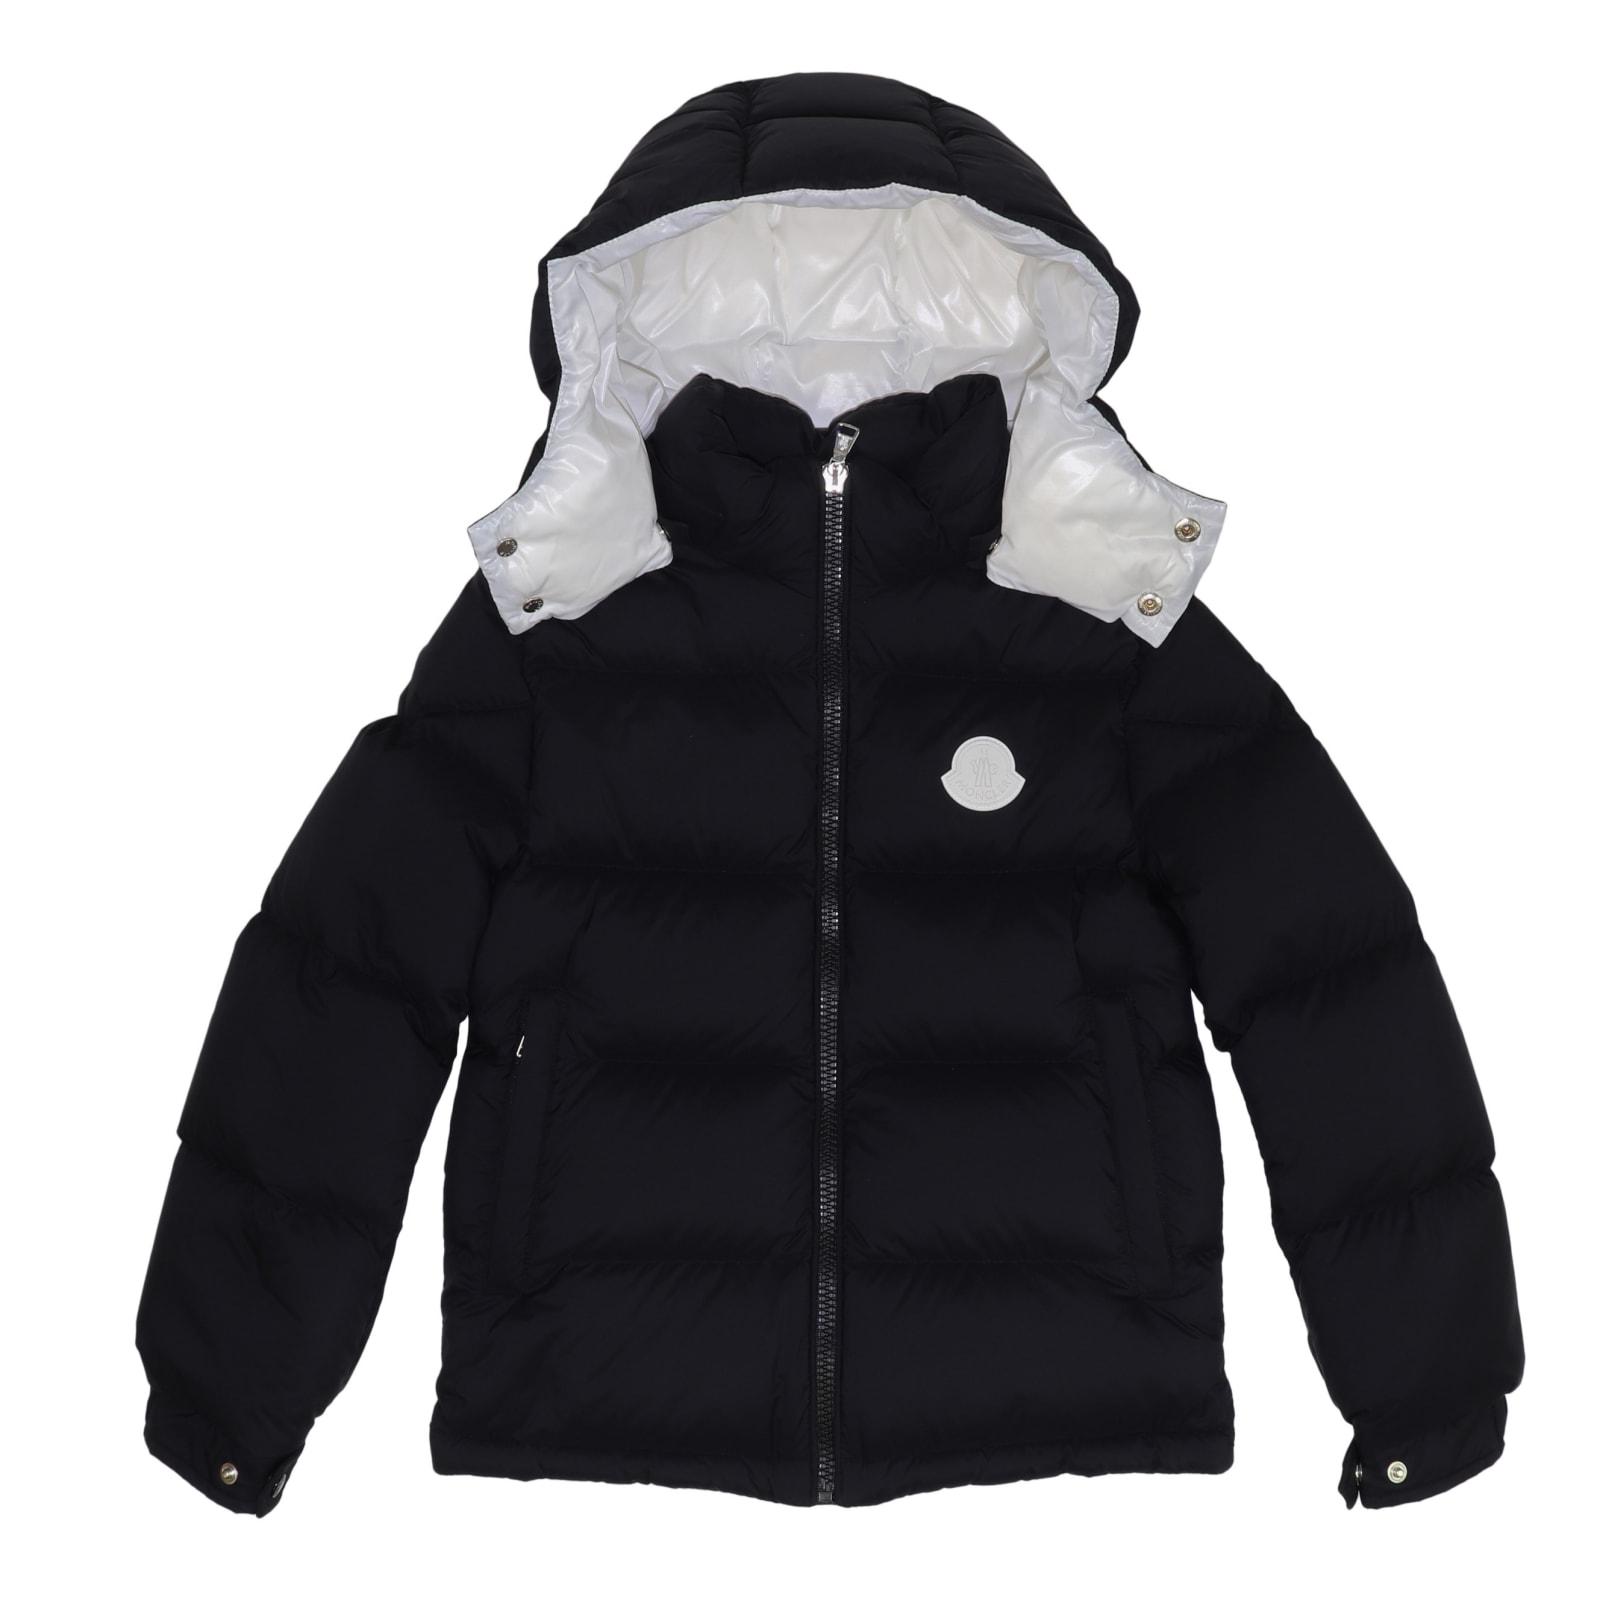 Moncler Ercan Jacket